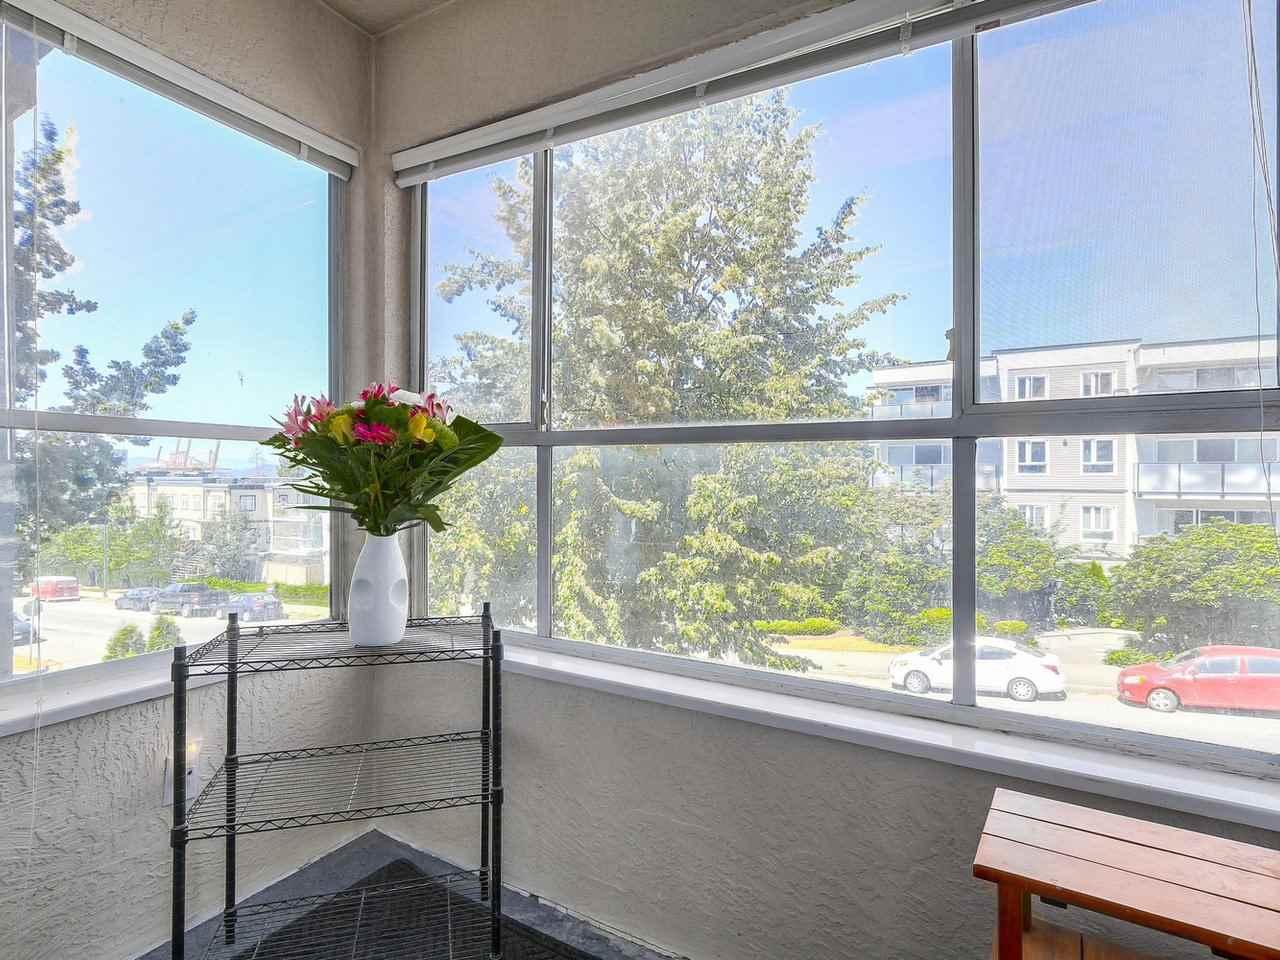 Condo Apartment at 301 120 GARDEN DRIVE, Unit 301, Vancouver East, British Columbia. Image 6